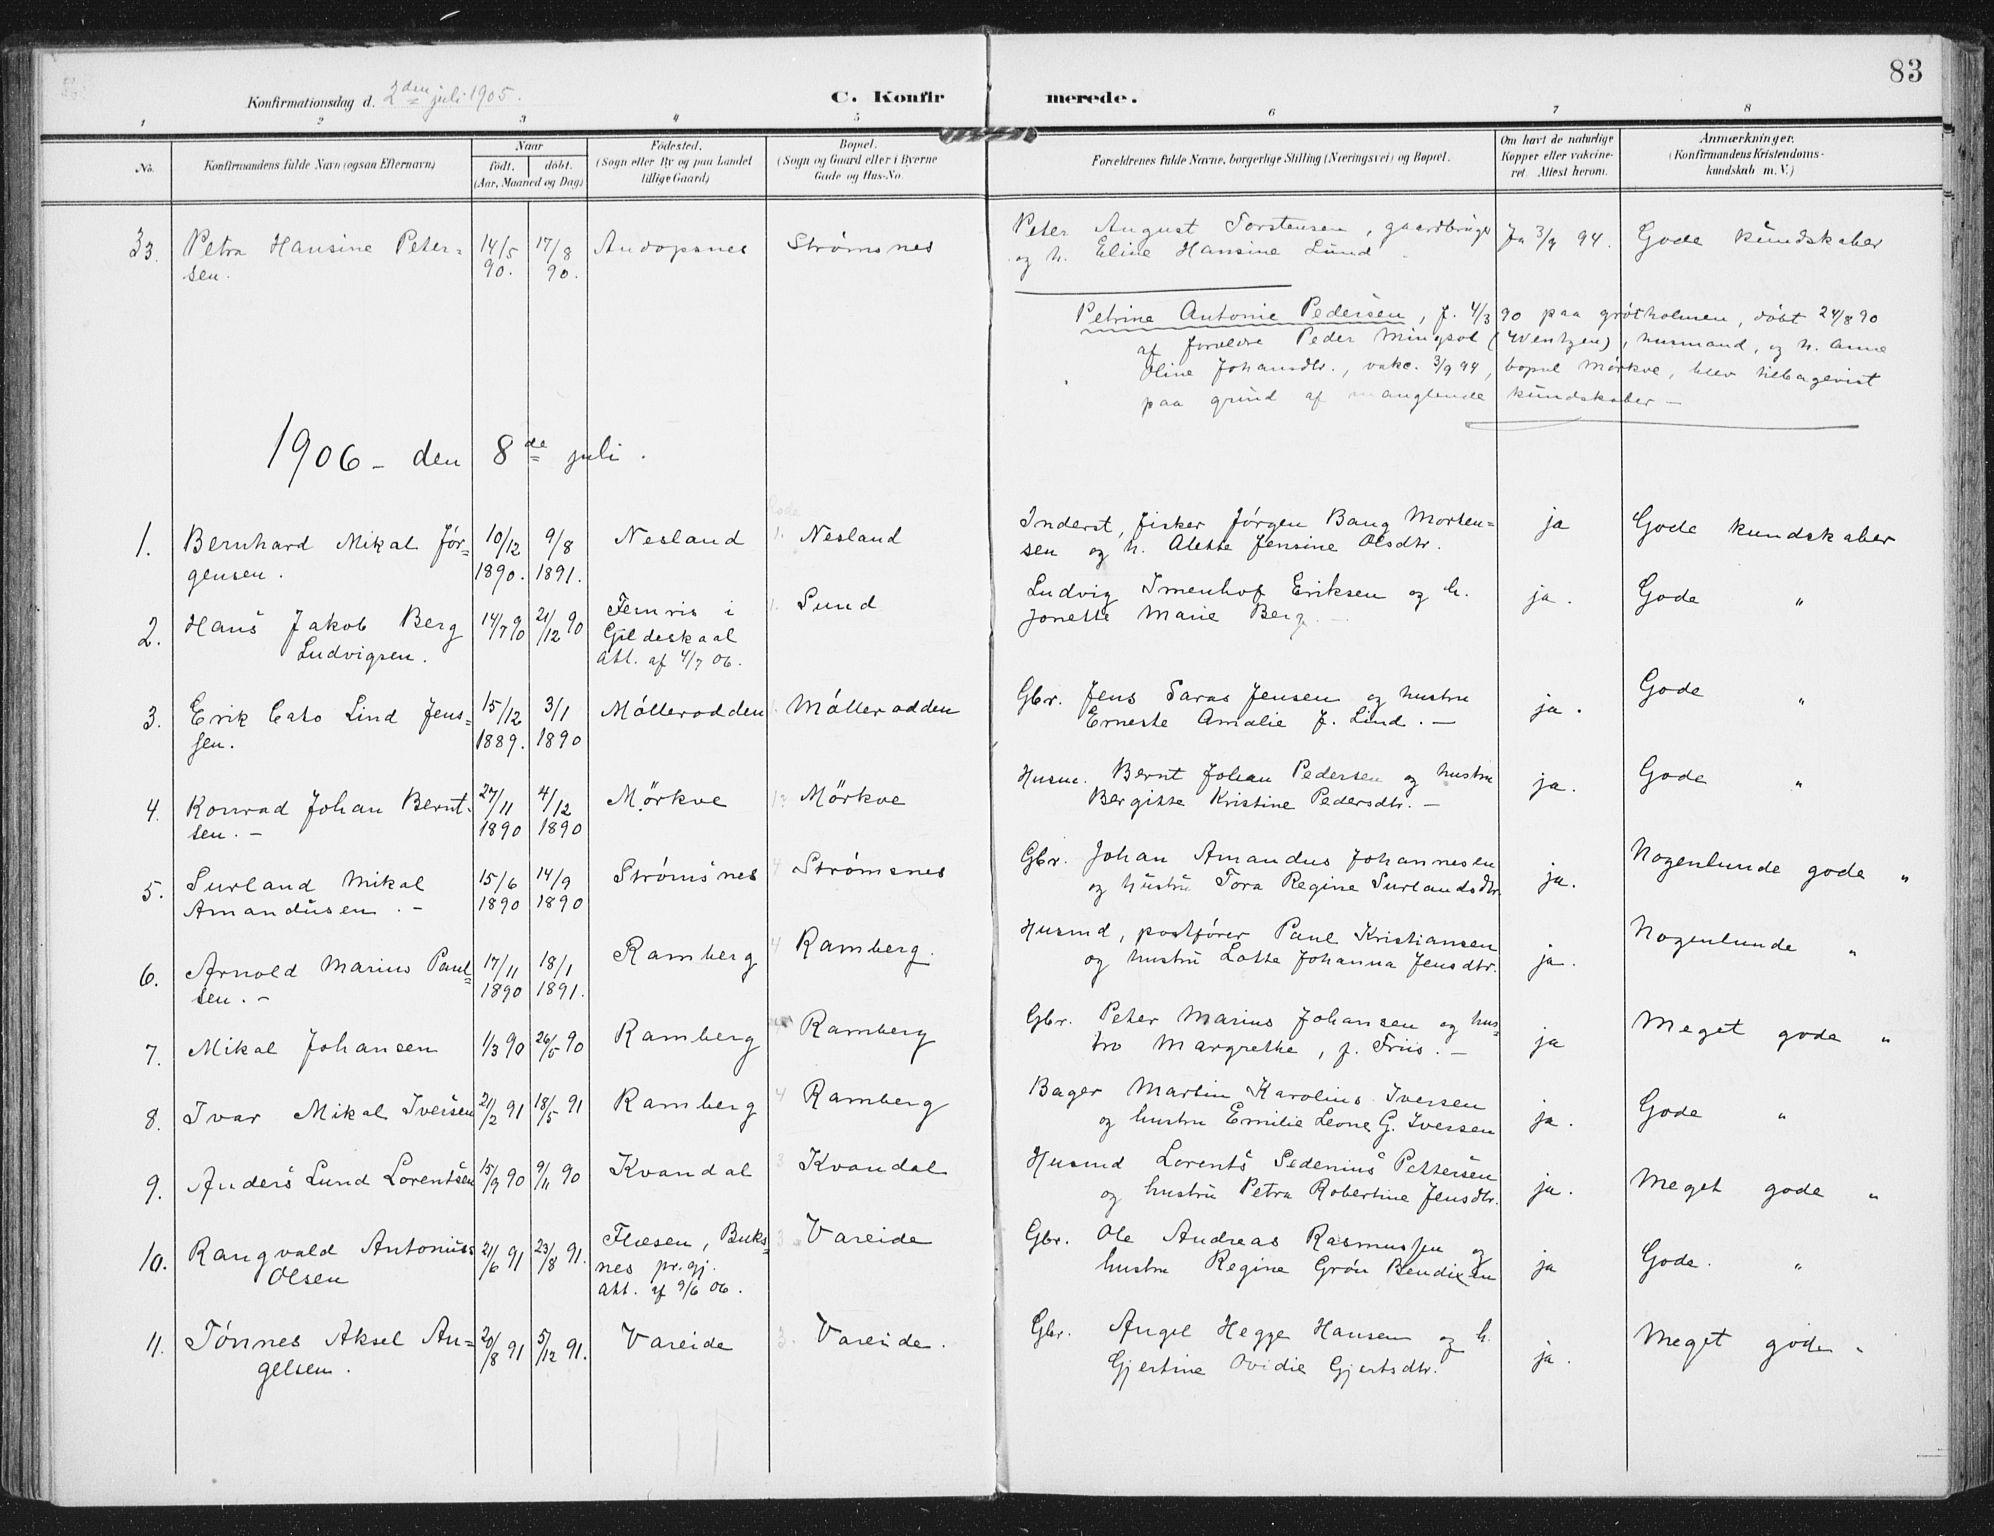 SAT, Ministerialprotokoller, klokkerbøker og fødselsregistre - Nordland, 885/L1206: Ministerialbok nr. 885A07, 1905-1915, s. 83